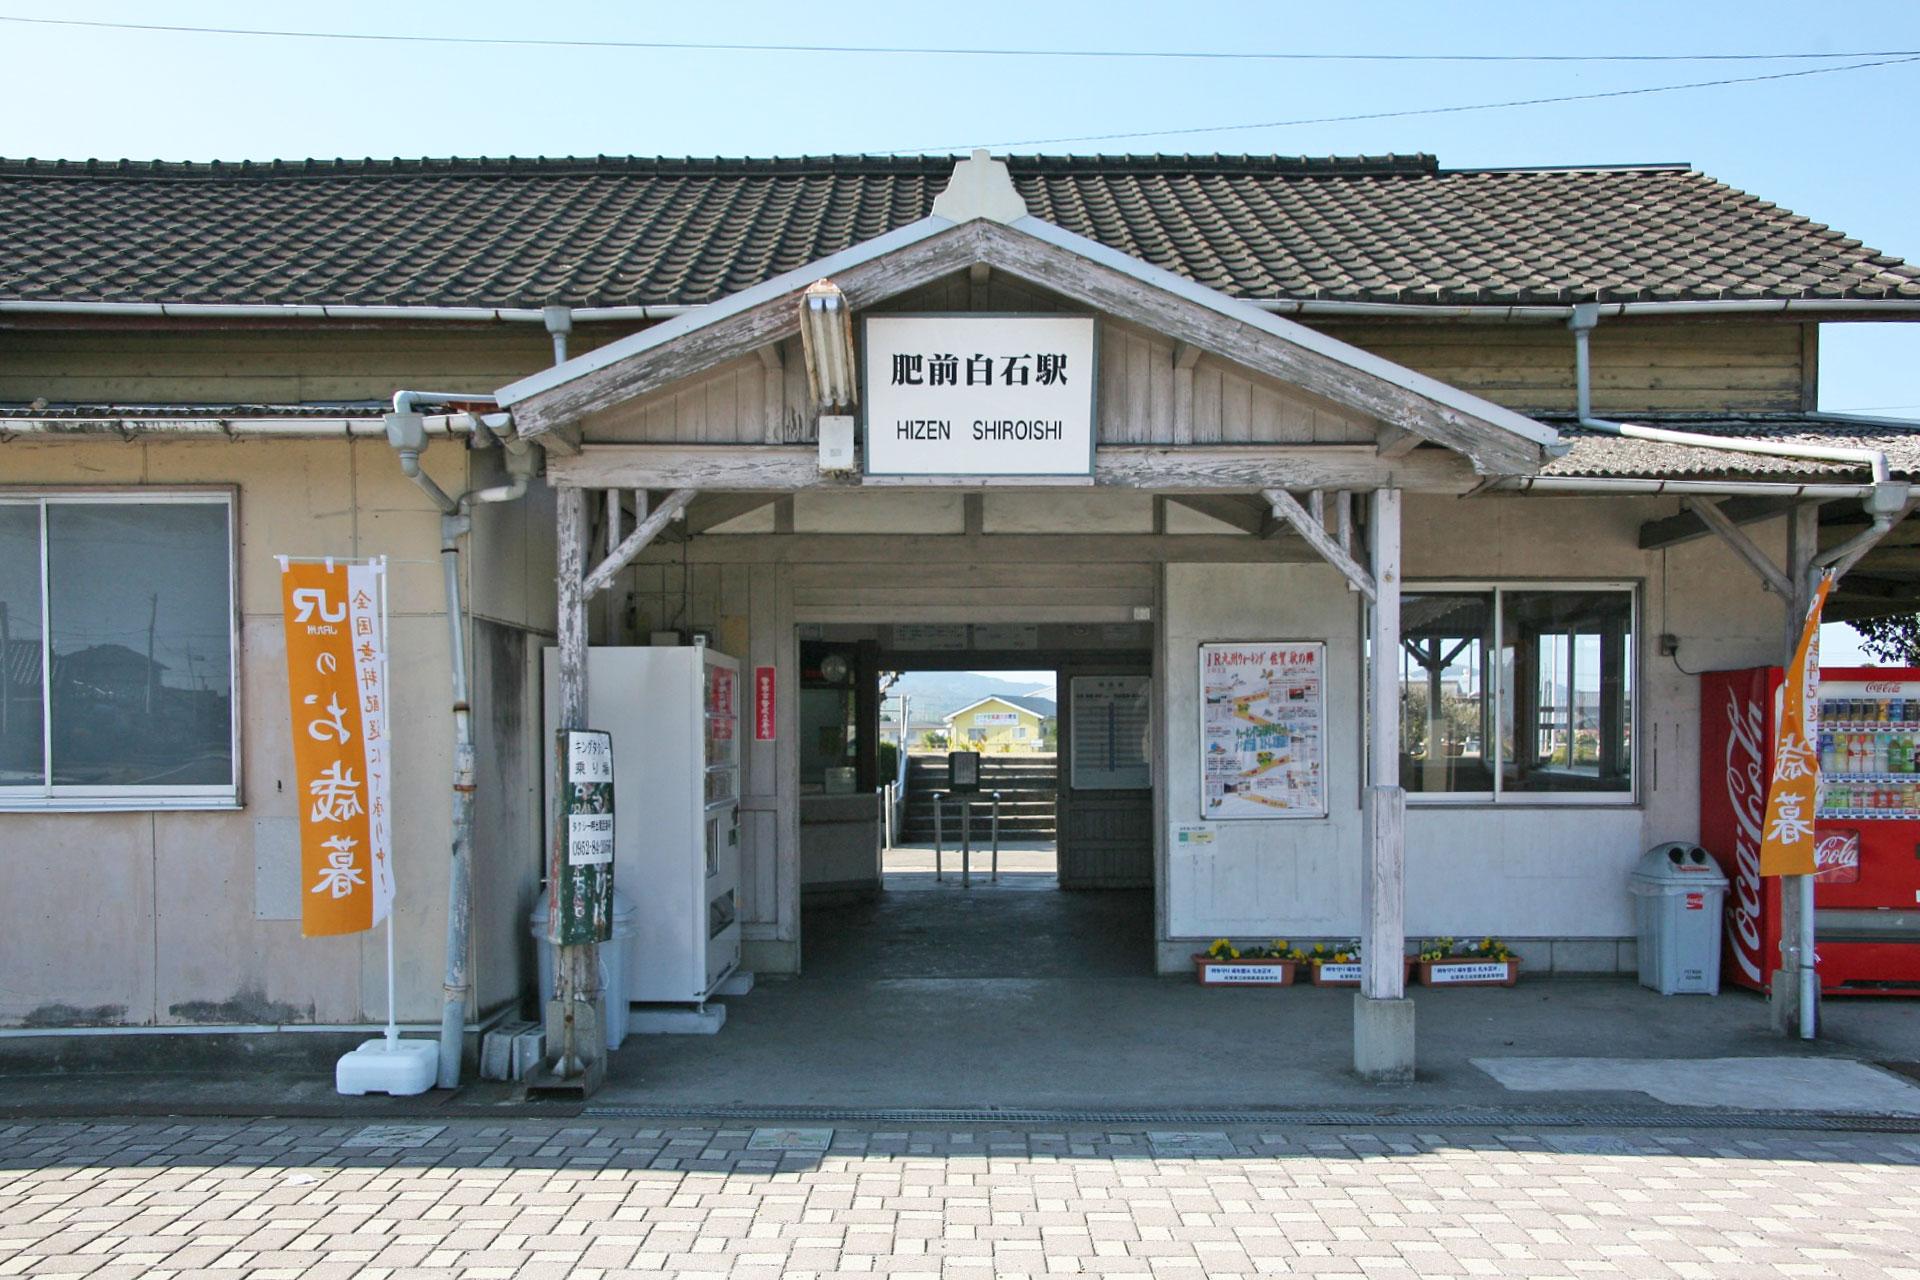 肥前白石駅 佐賀の風景